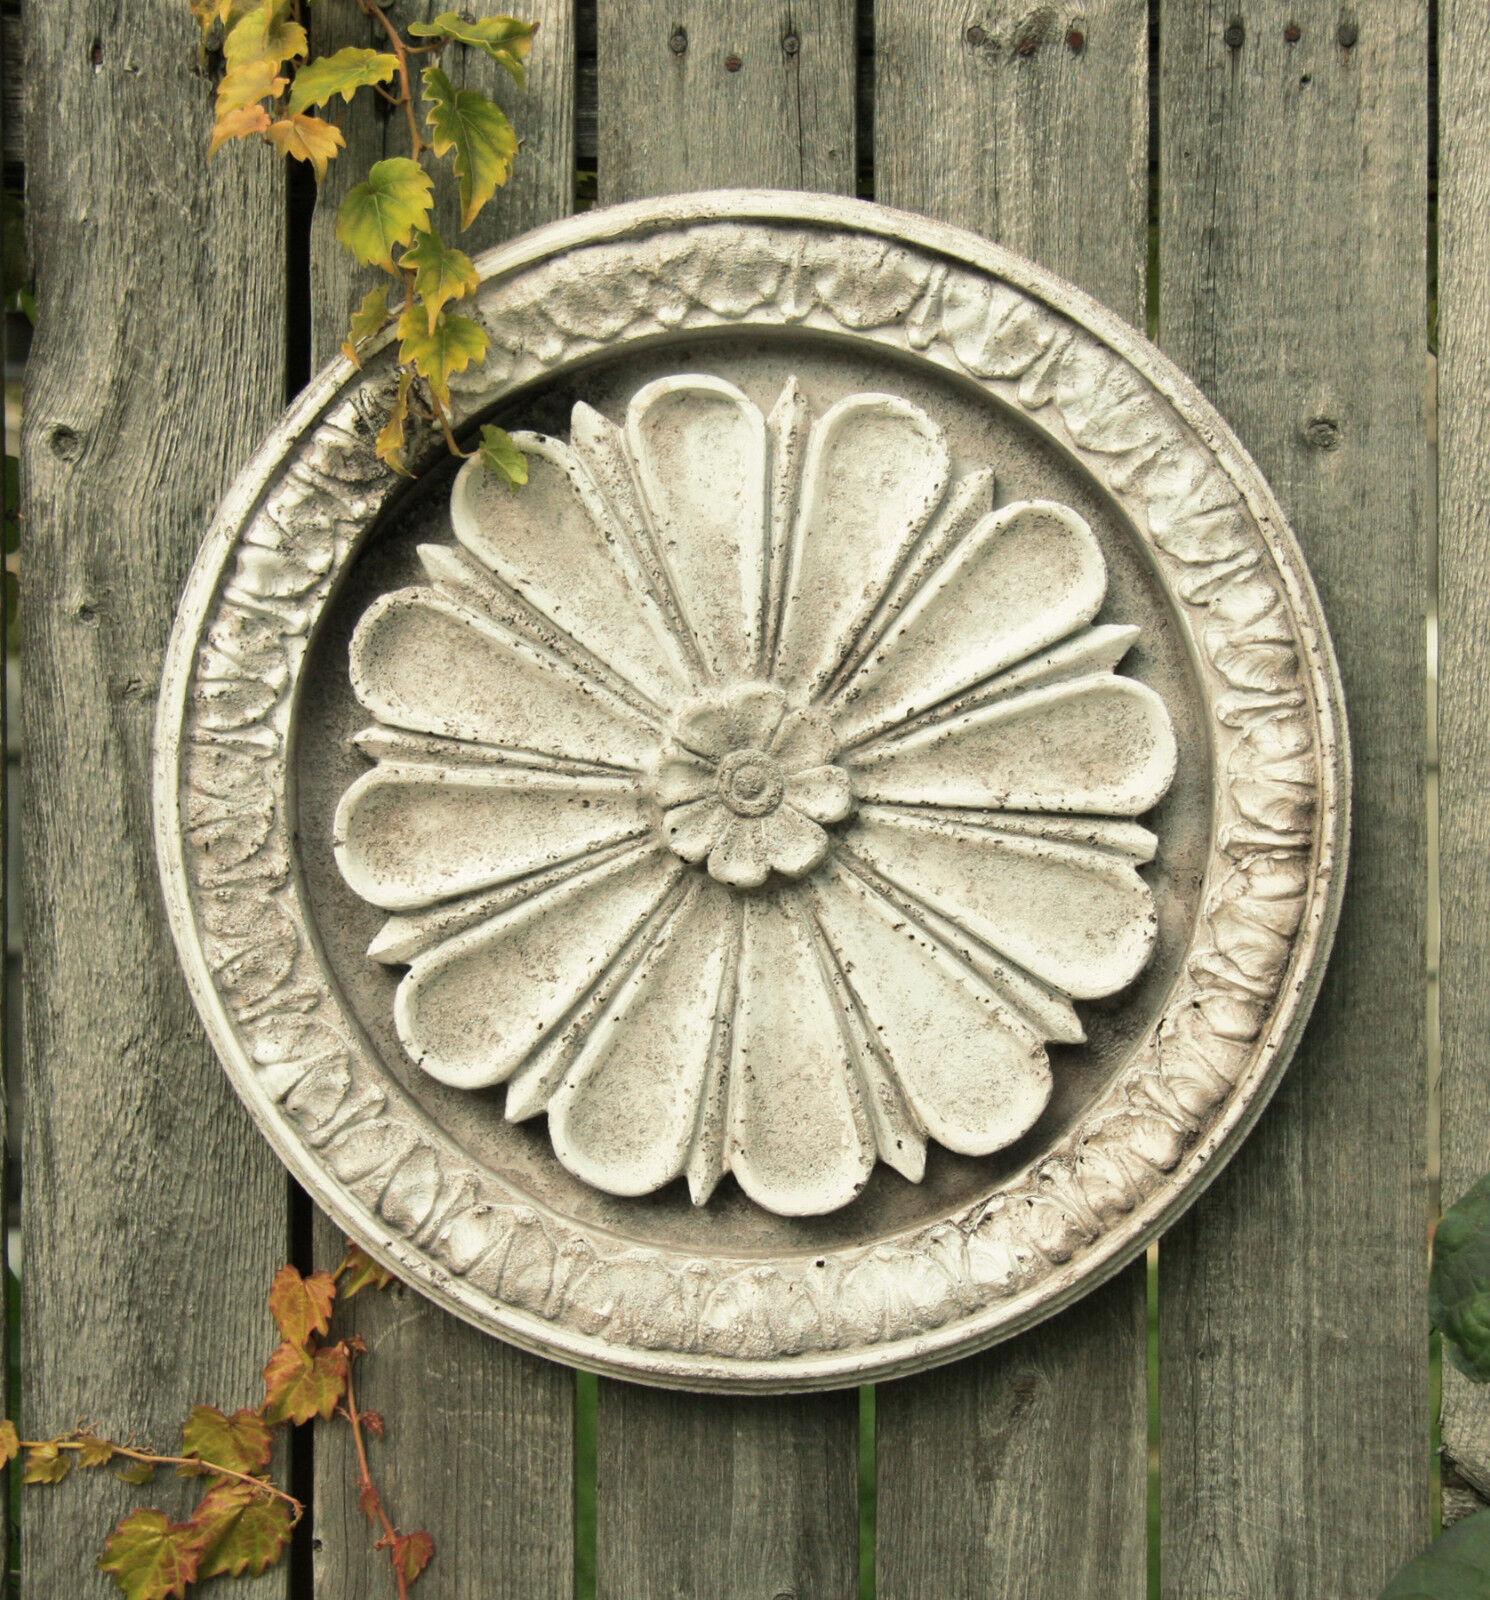 Abbott Medallion Garden Wall Art Decor Sculpture Plaque by Orlandi FS7631